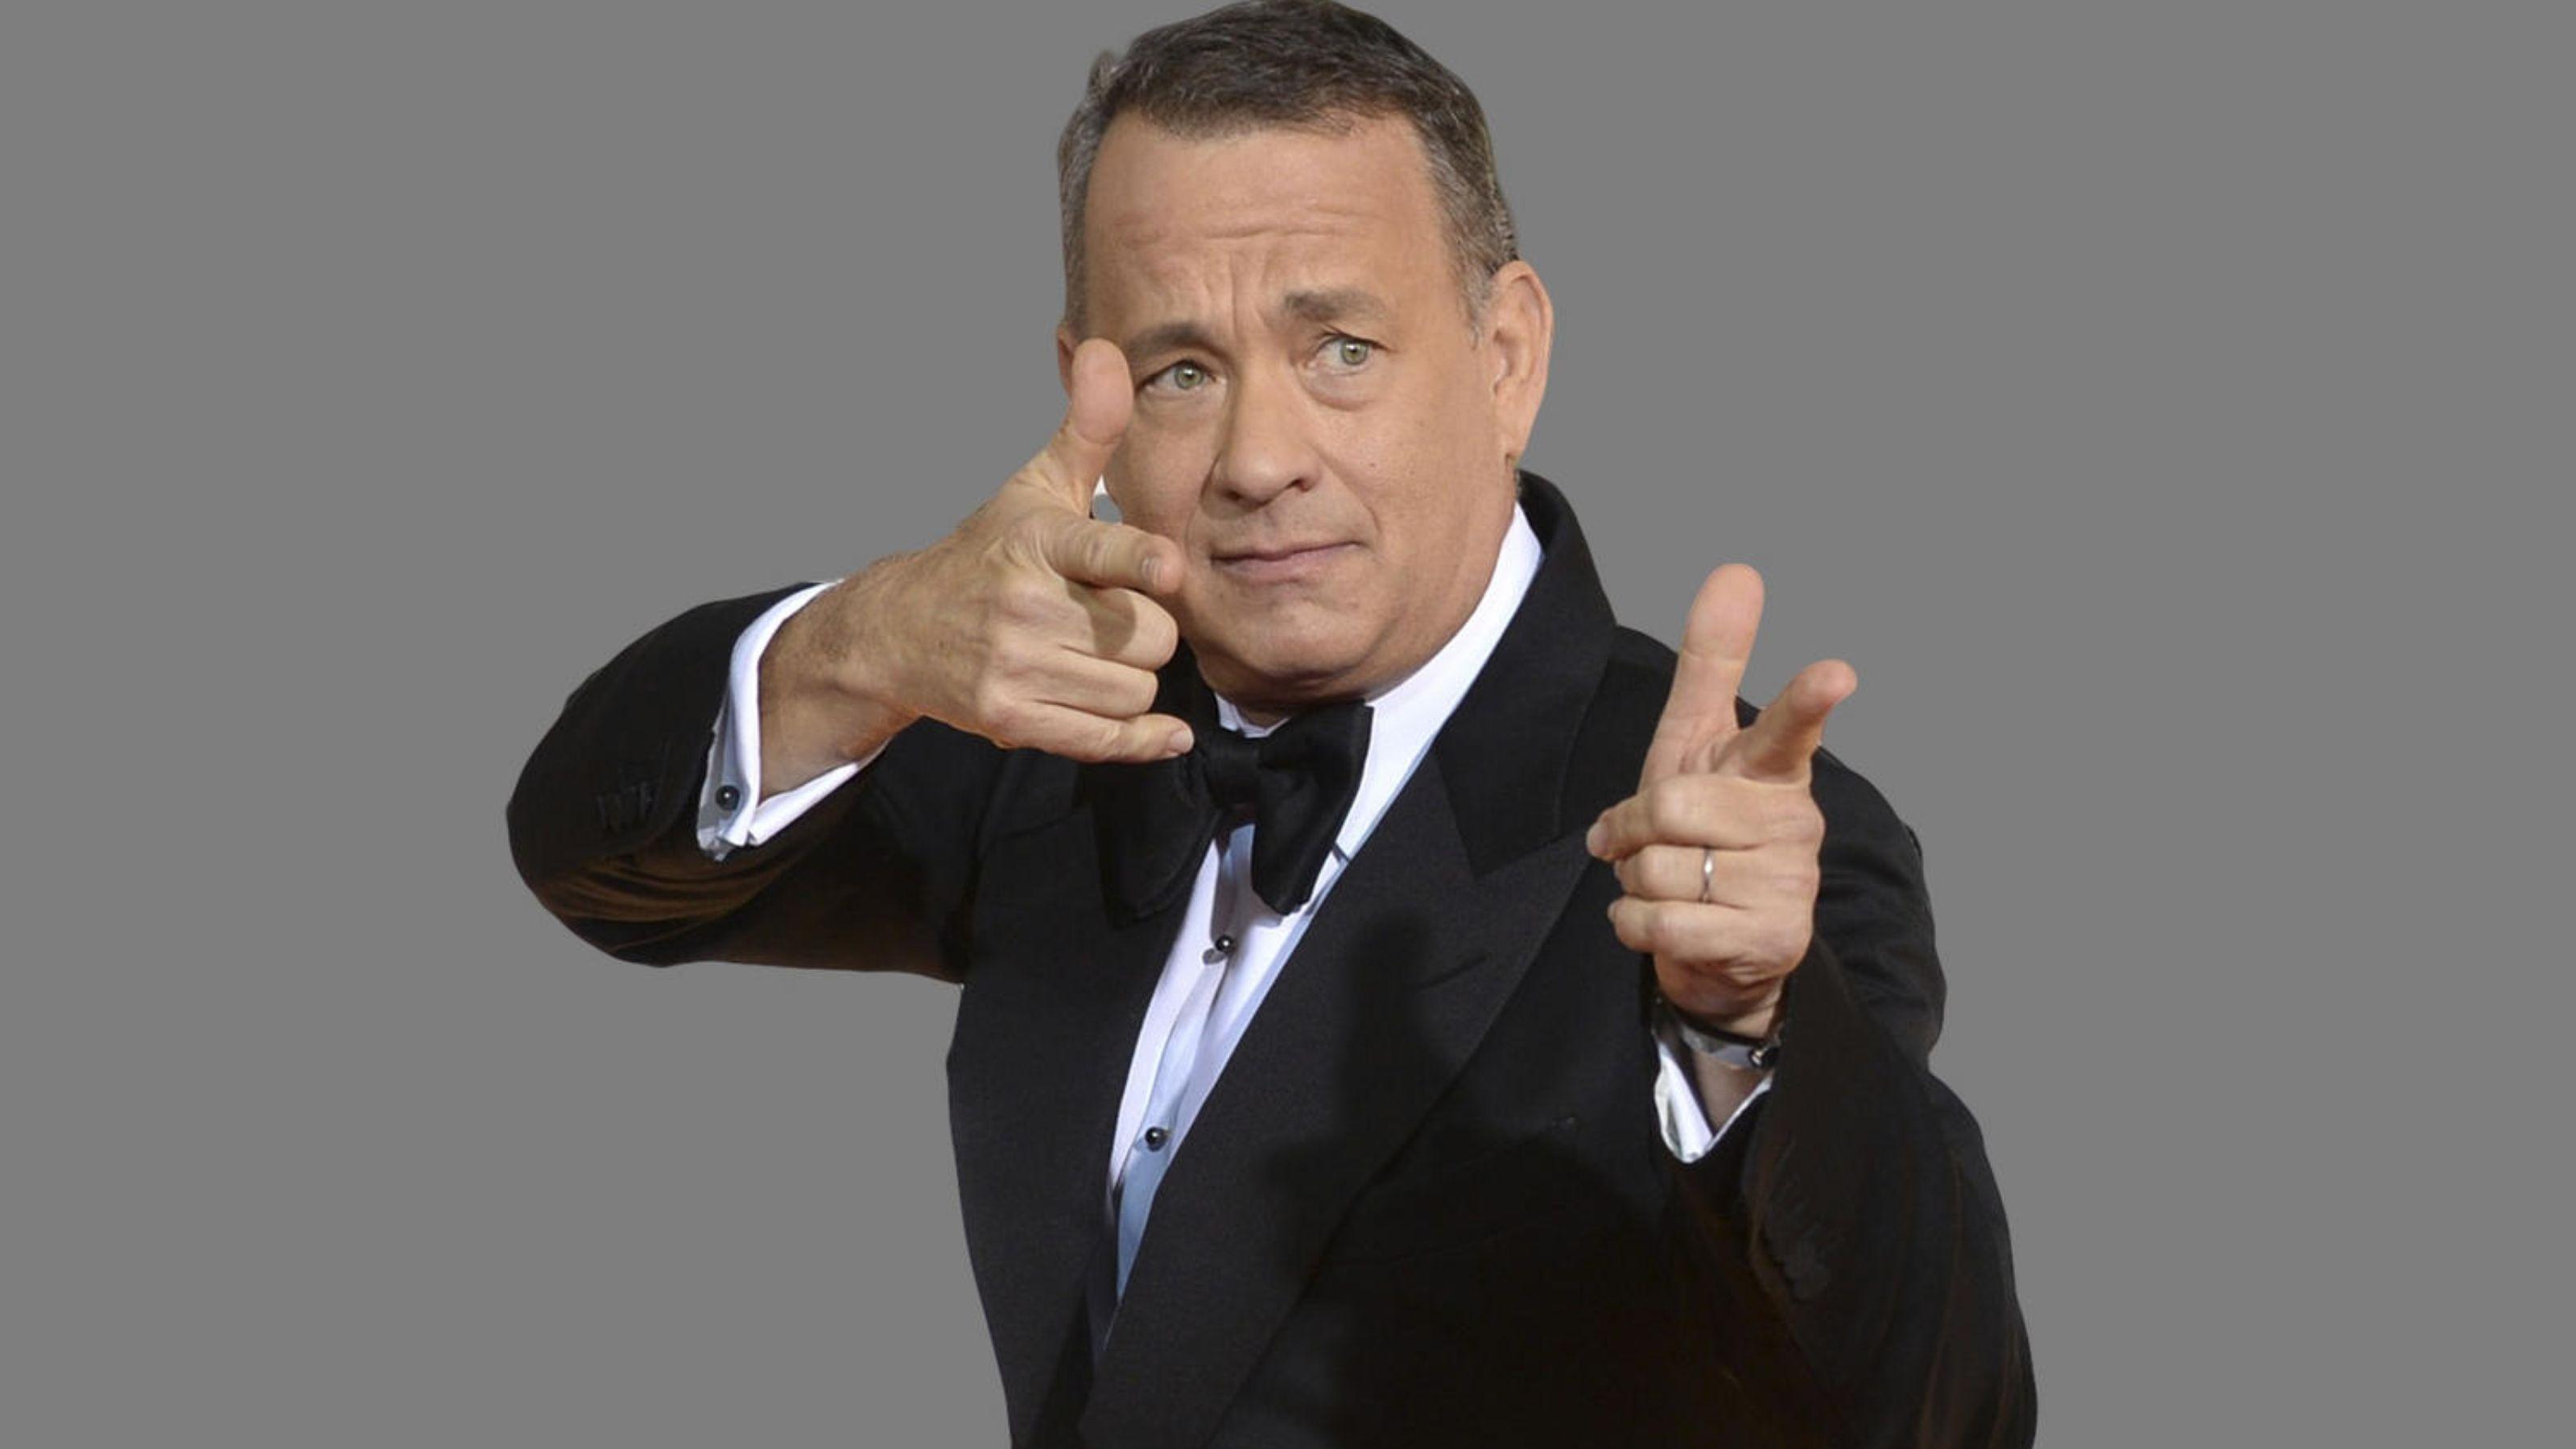 Actor, Óscar, Cine